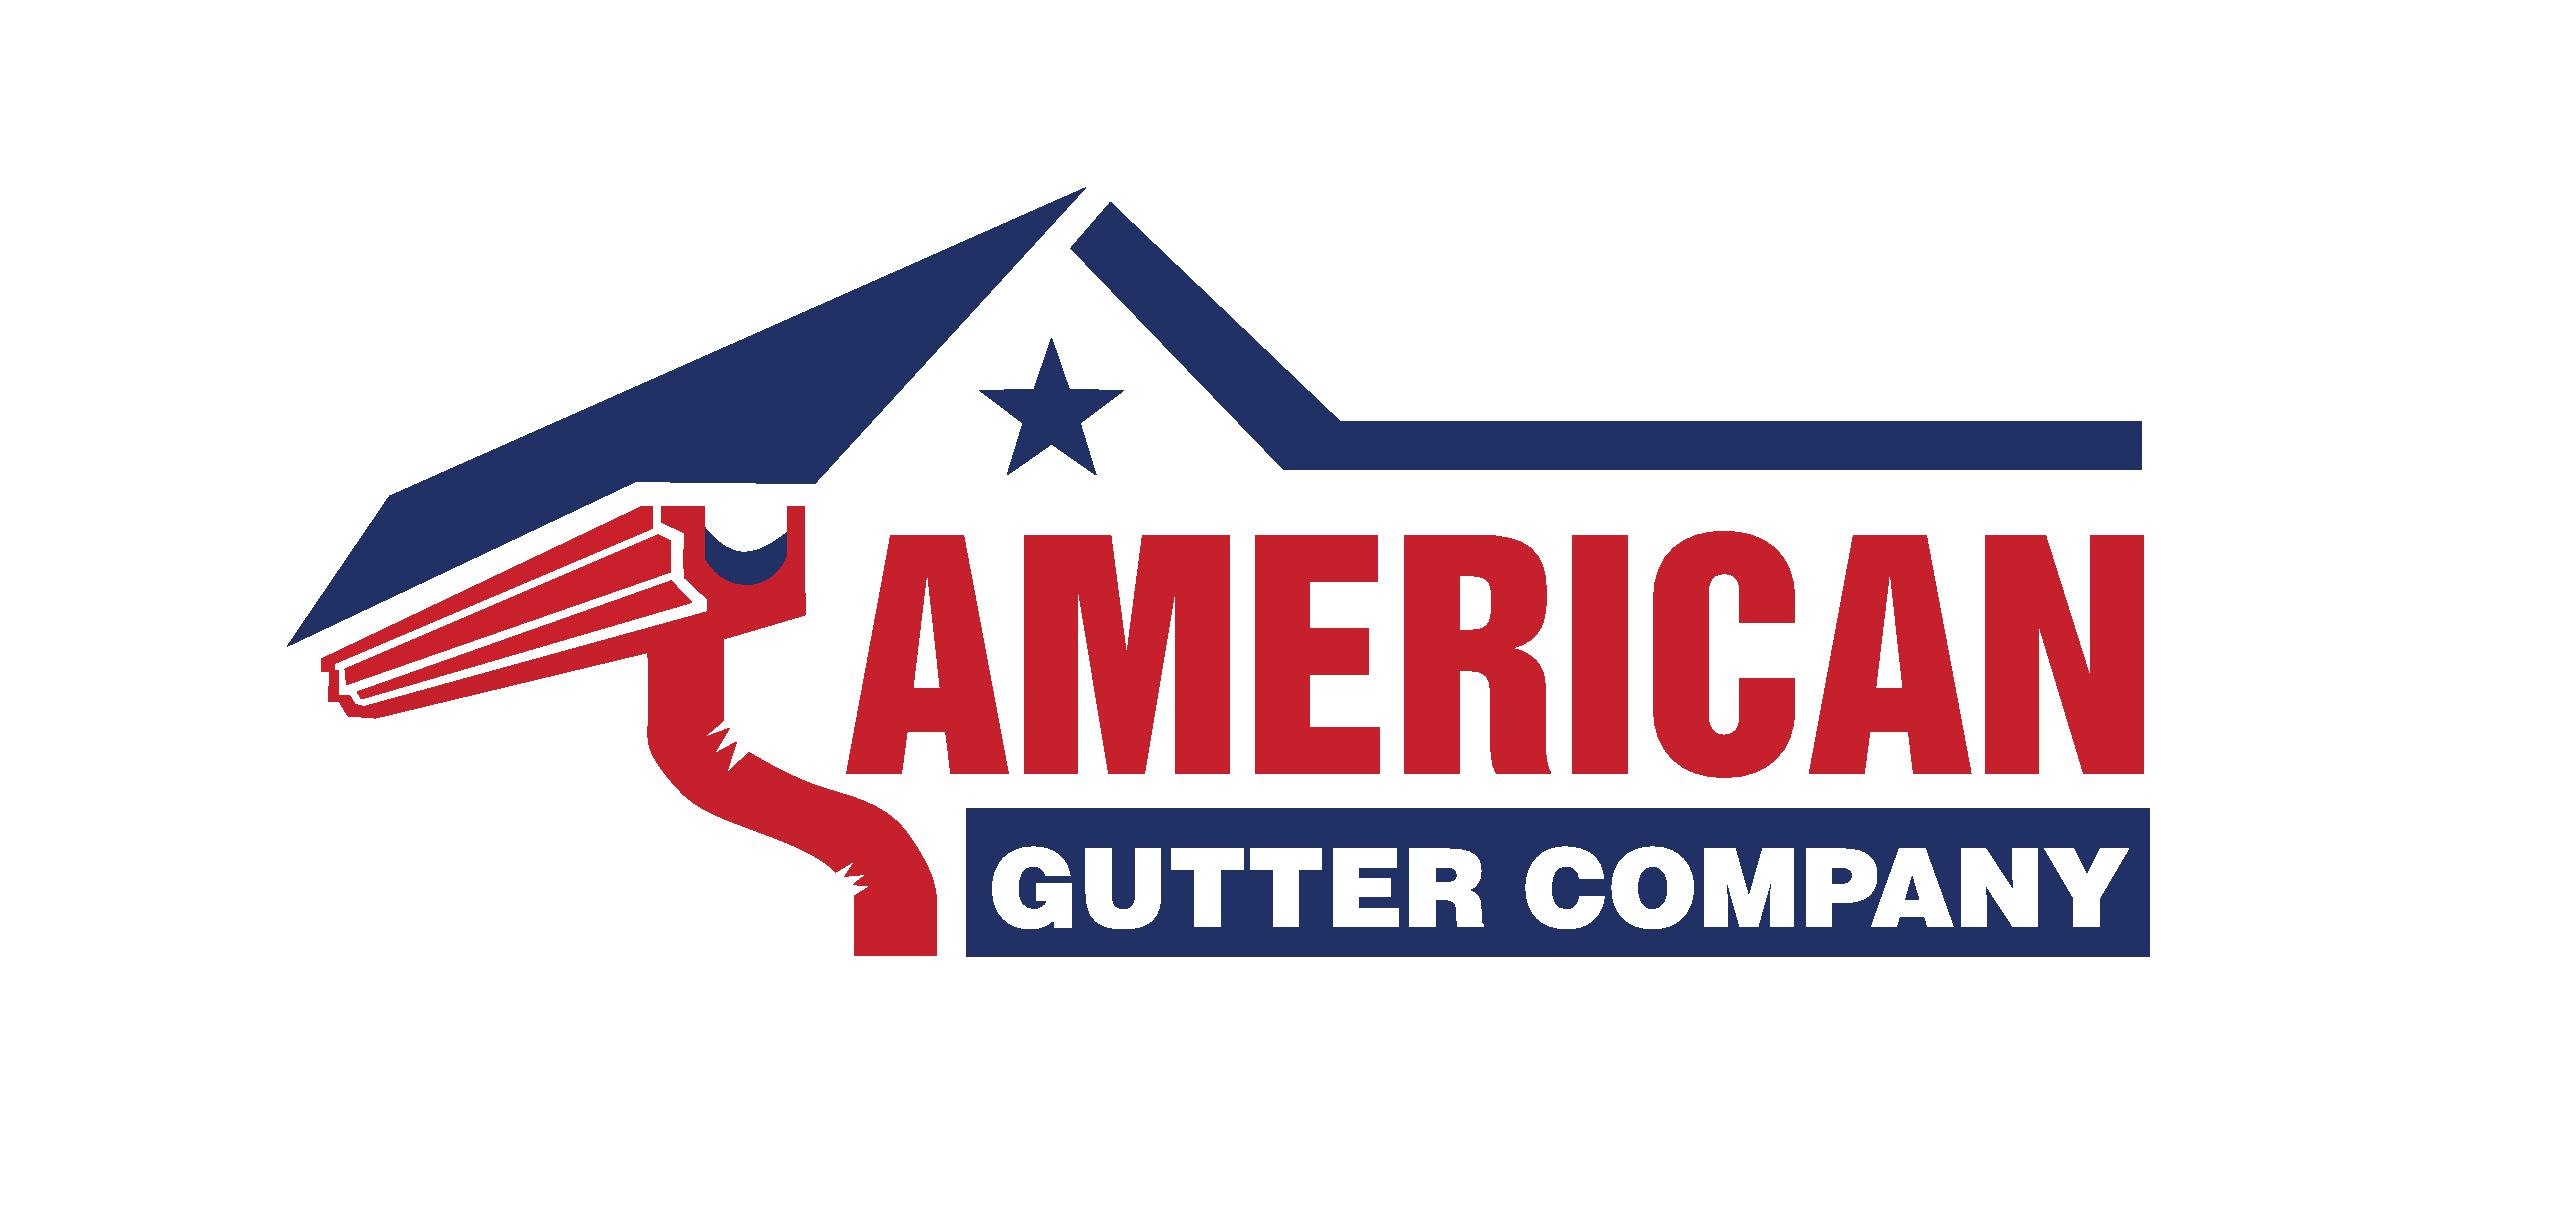 Gallery American Gutter Company Seamless Gutters